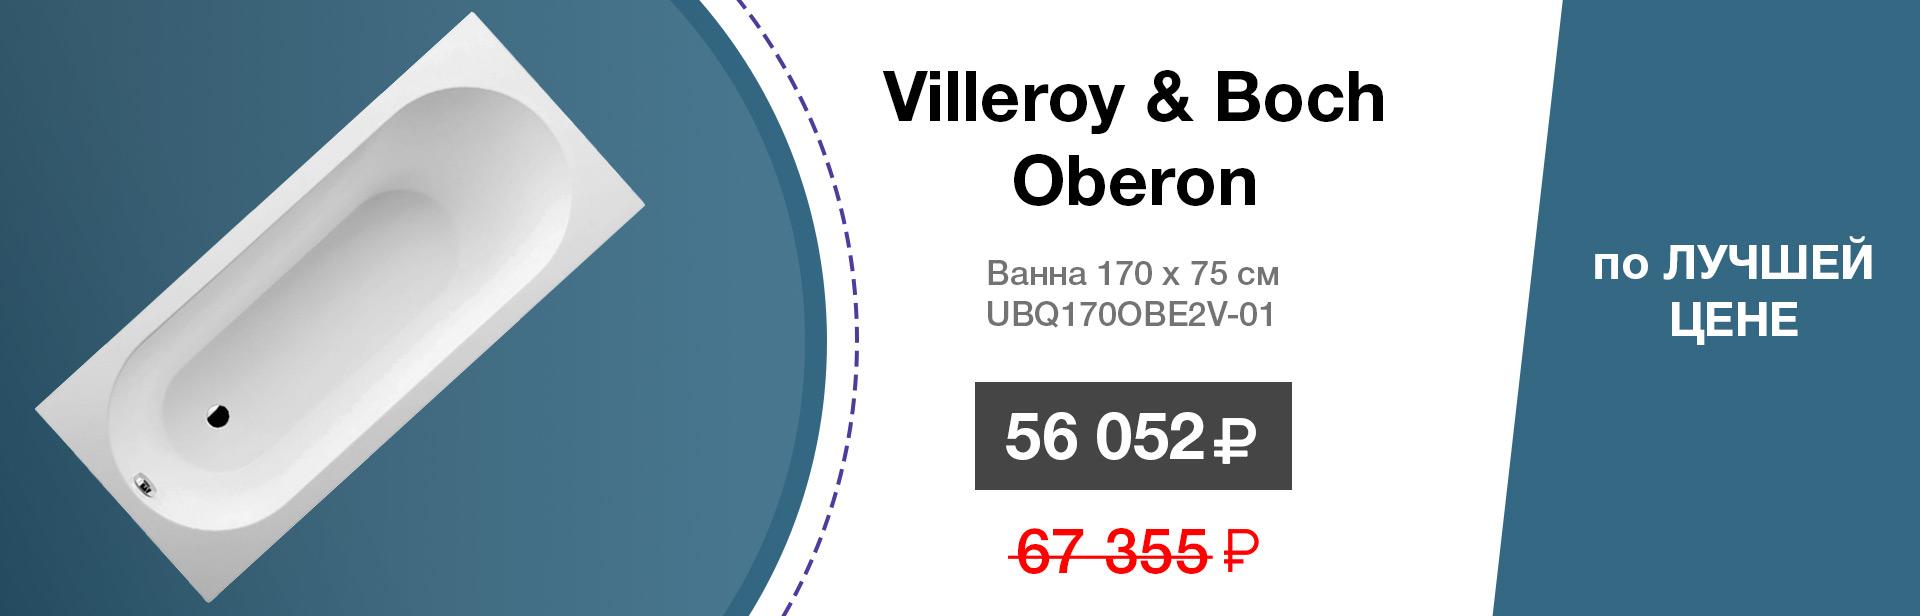 Villeroy-_amp_-Boch-Oberon-UBQ170OBE2V-01-Vanna-170-x-75-sm